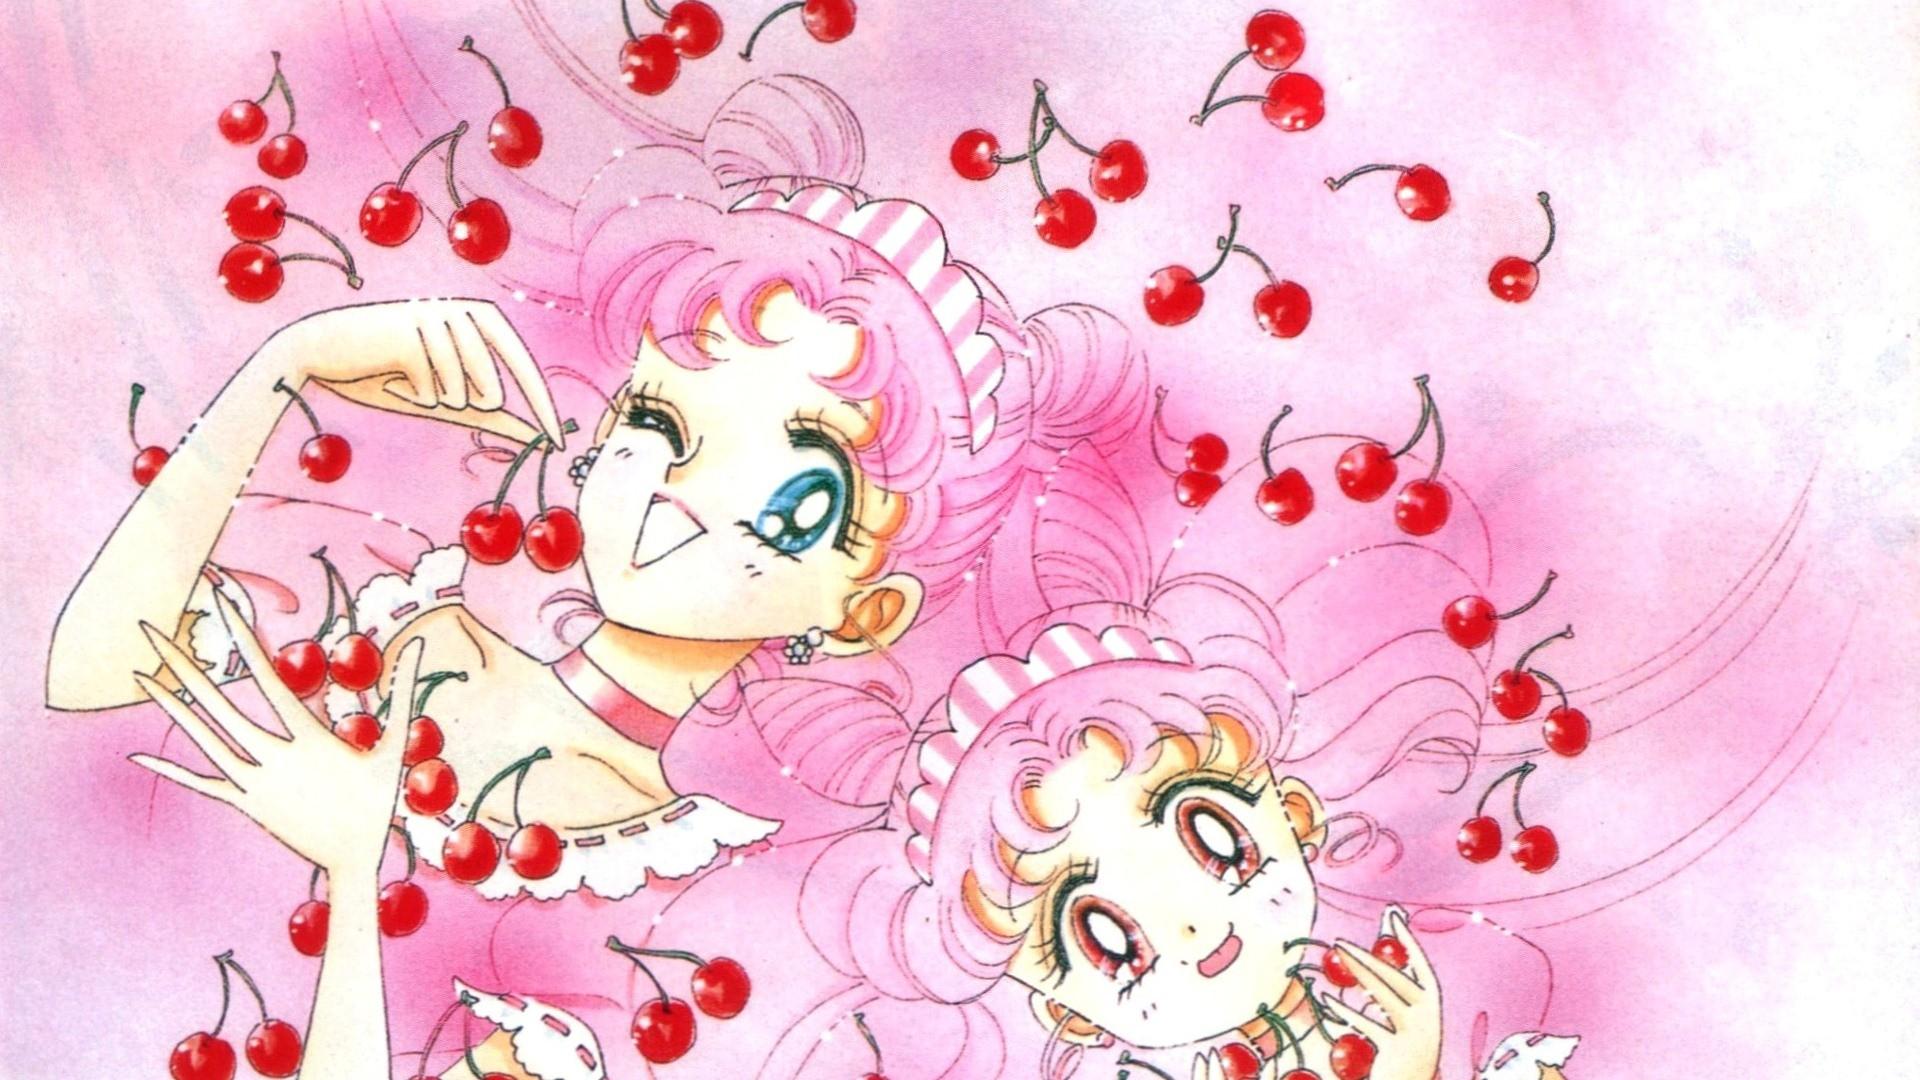 1920x1080 Sailor Moon HD wallpapers #2 - 1920x1080.